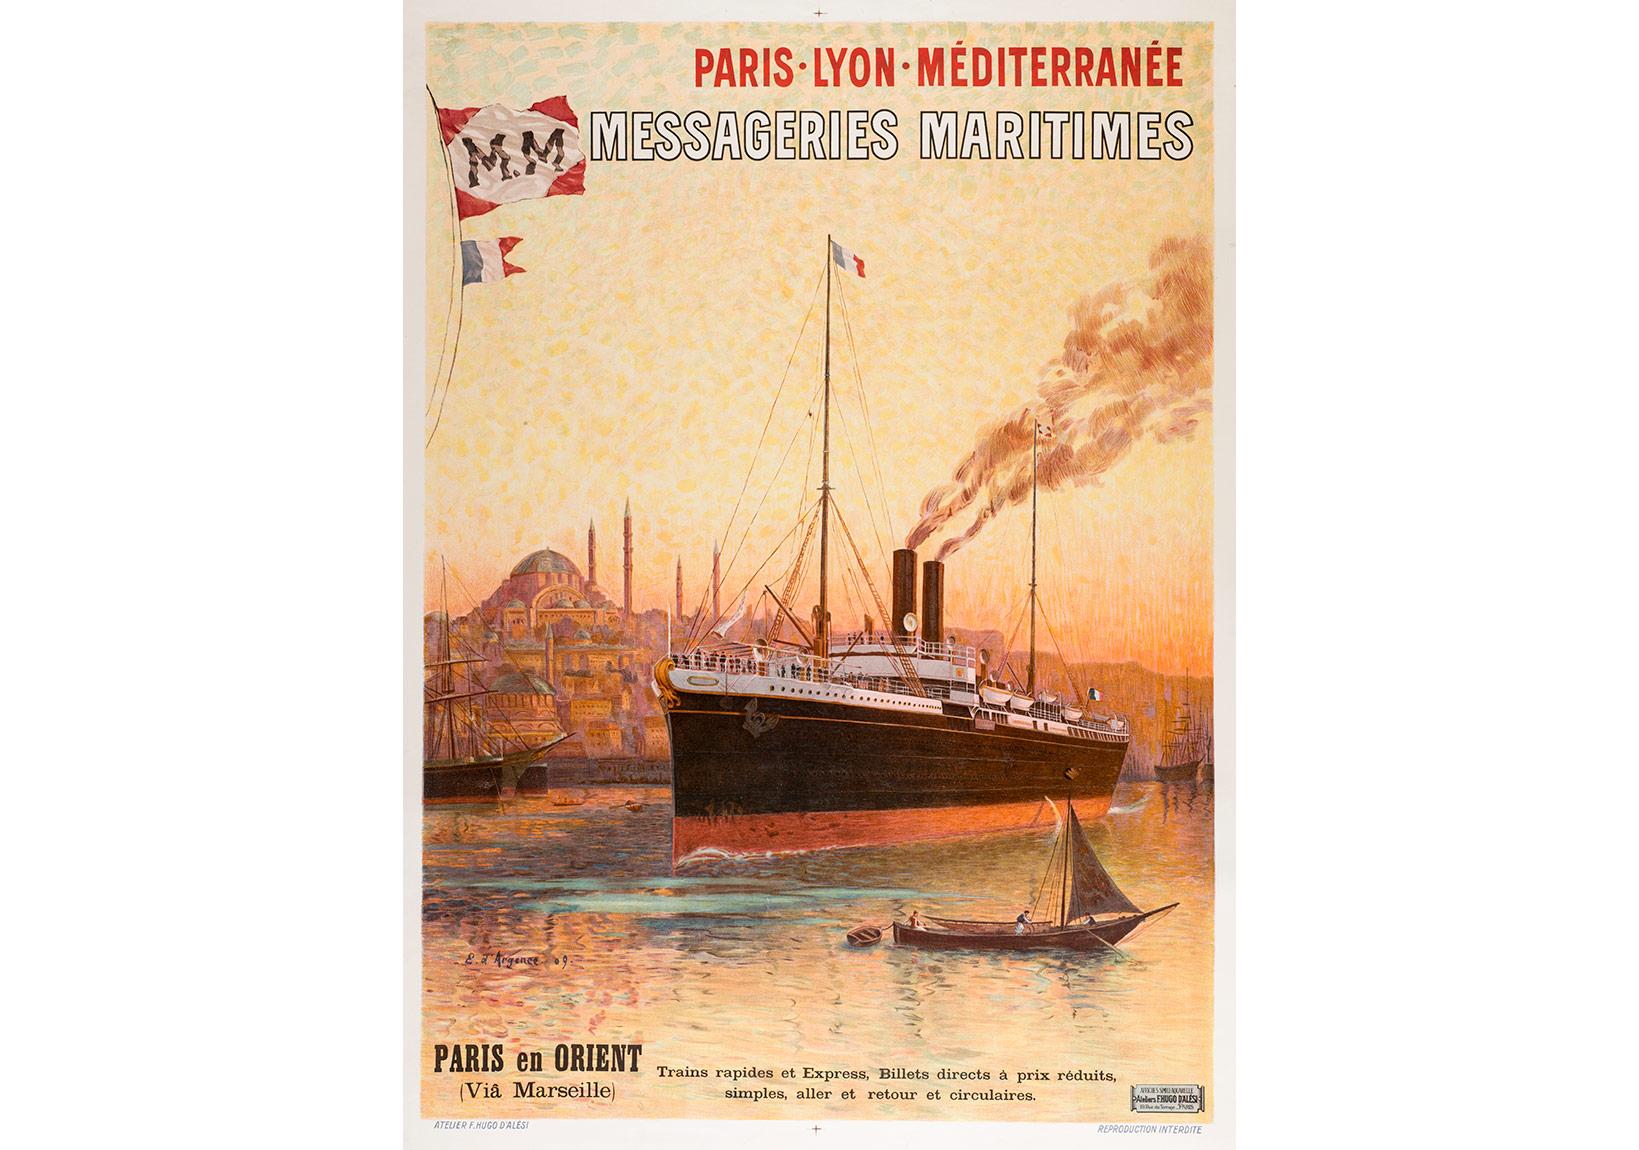 Compagnie des Messageries Maritimes'in afişi. Çizim Eugène d'Argence, 1909, Pierre de Gigord Koleksiyonu.